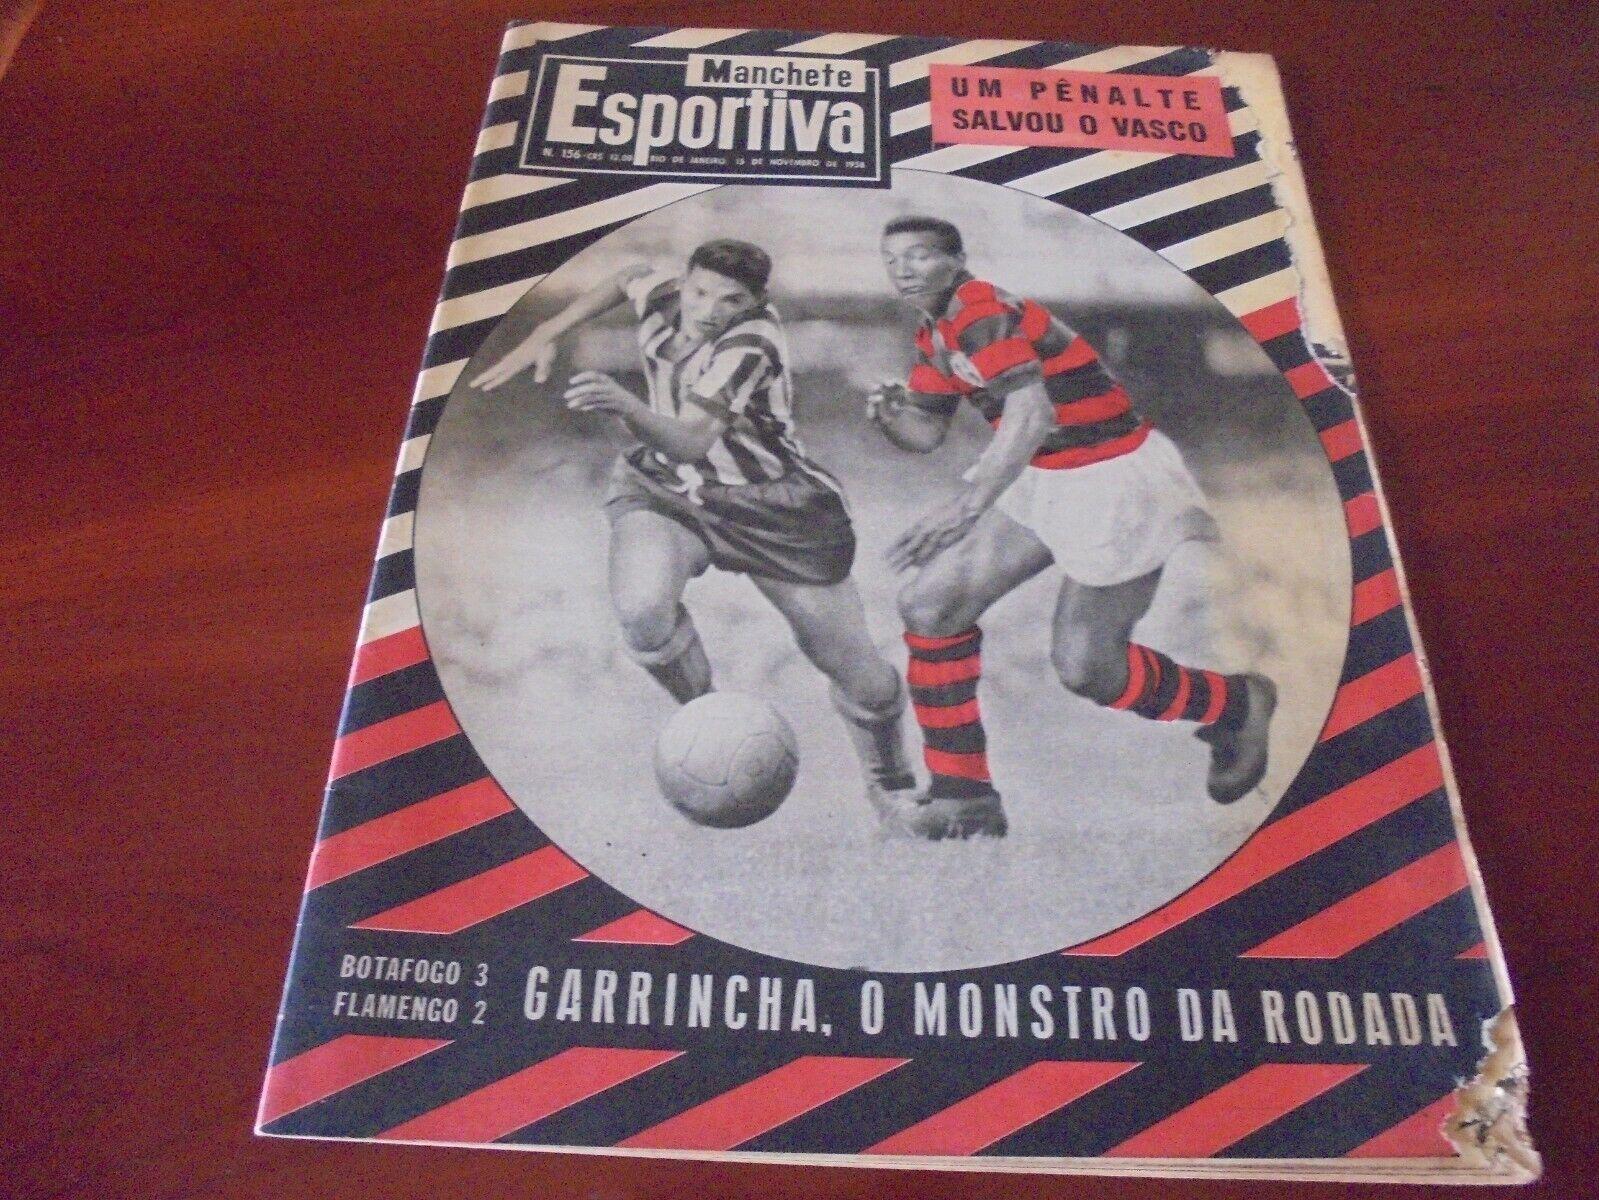 GARRINCHA PELÉ DIDI Botafogo vs Flamengo Brazilian Soccer Football Magazine